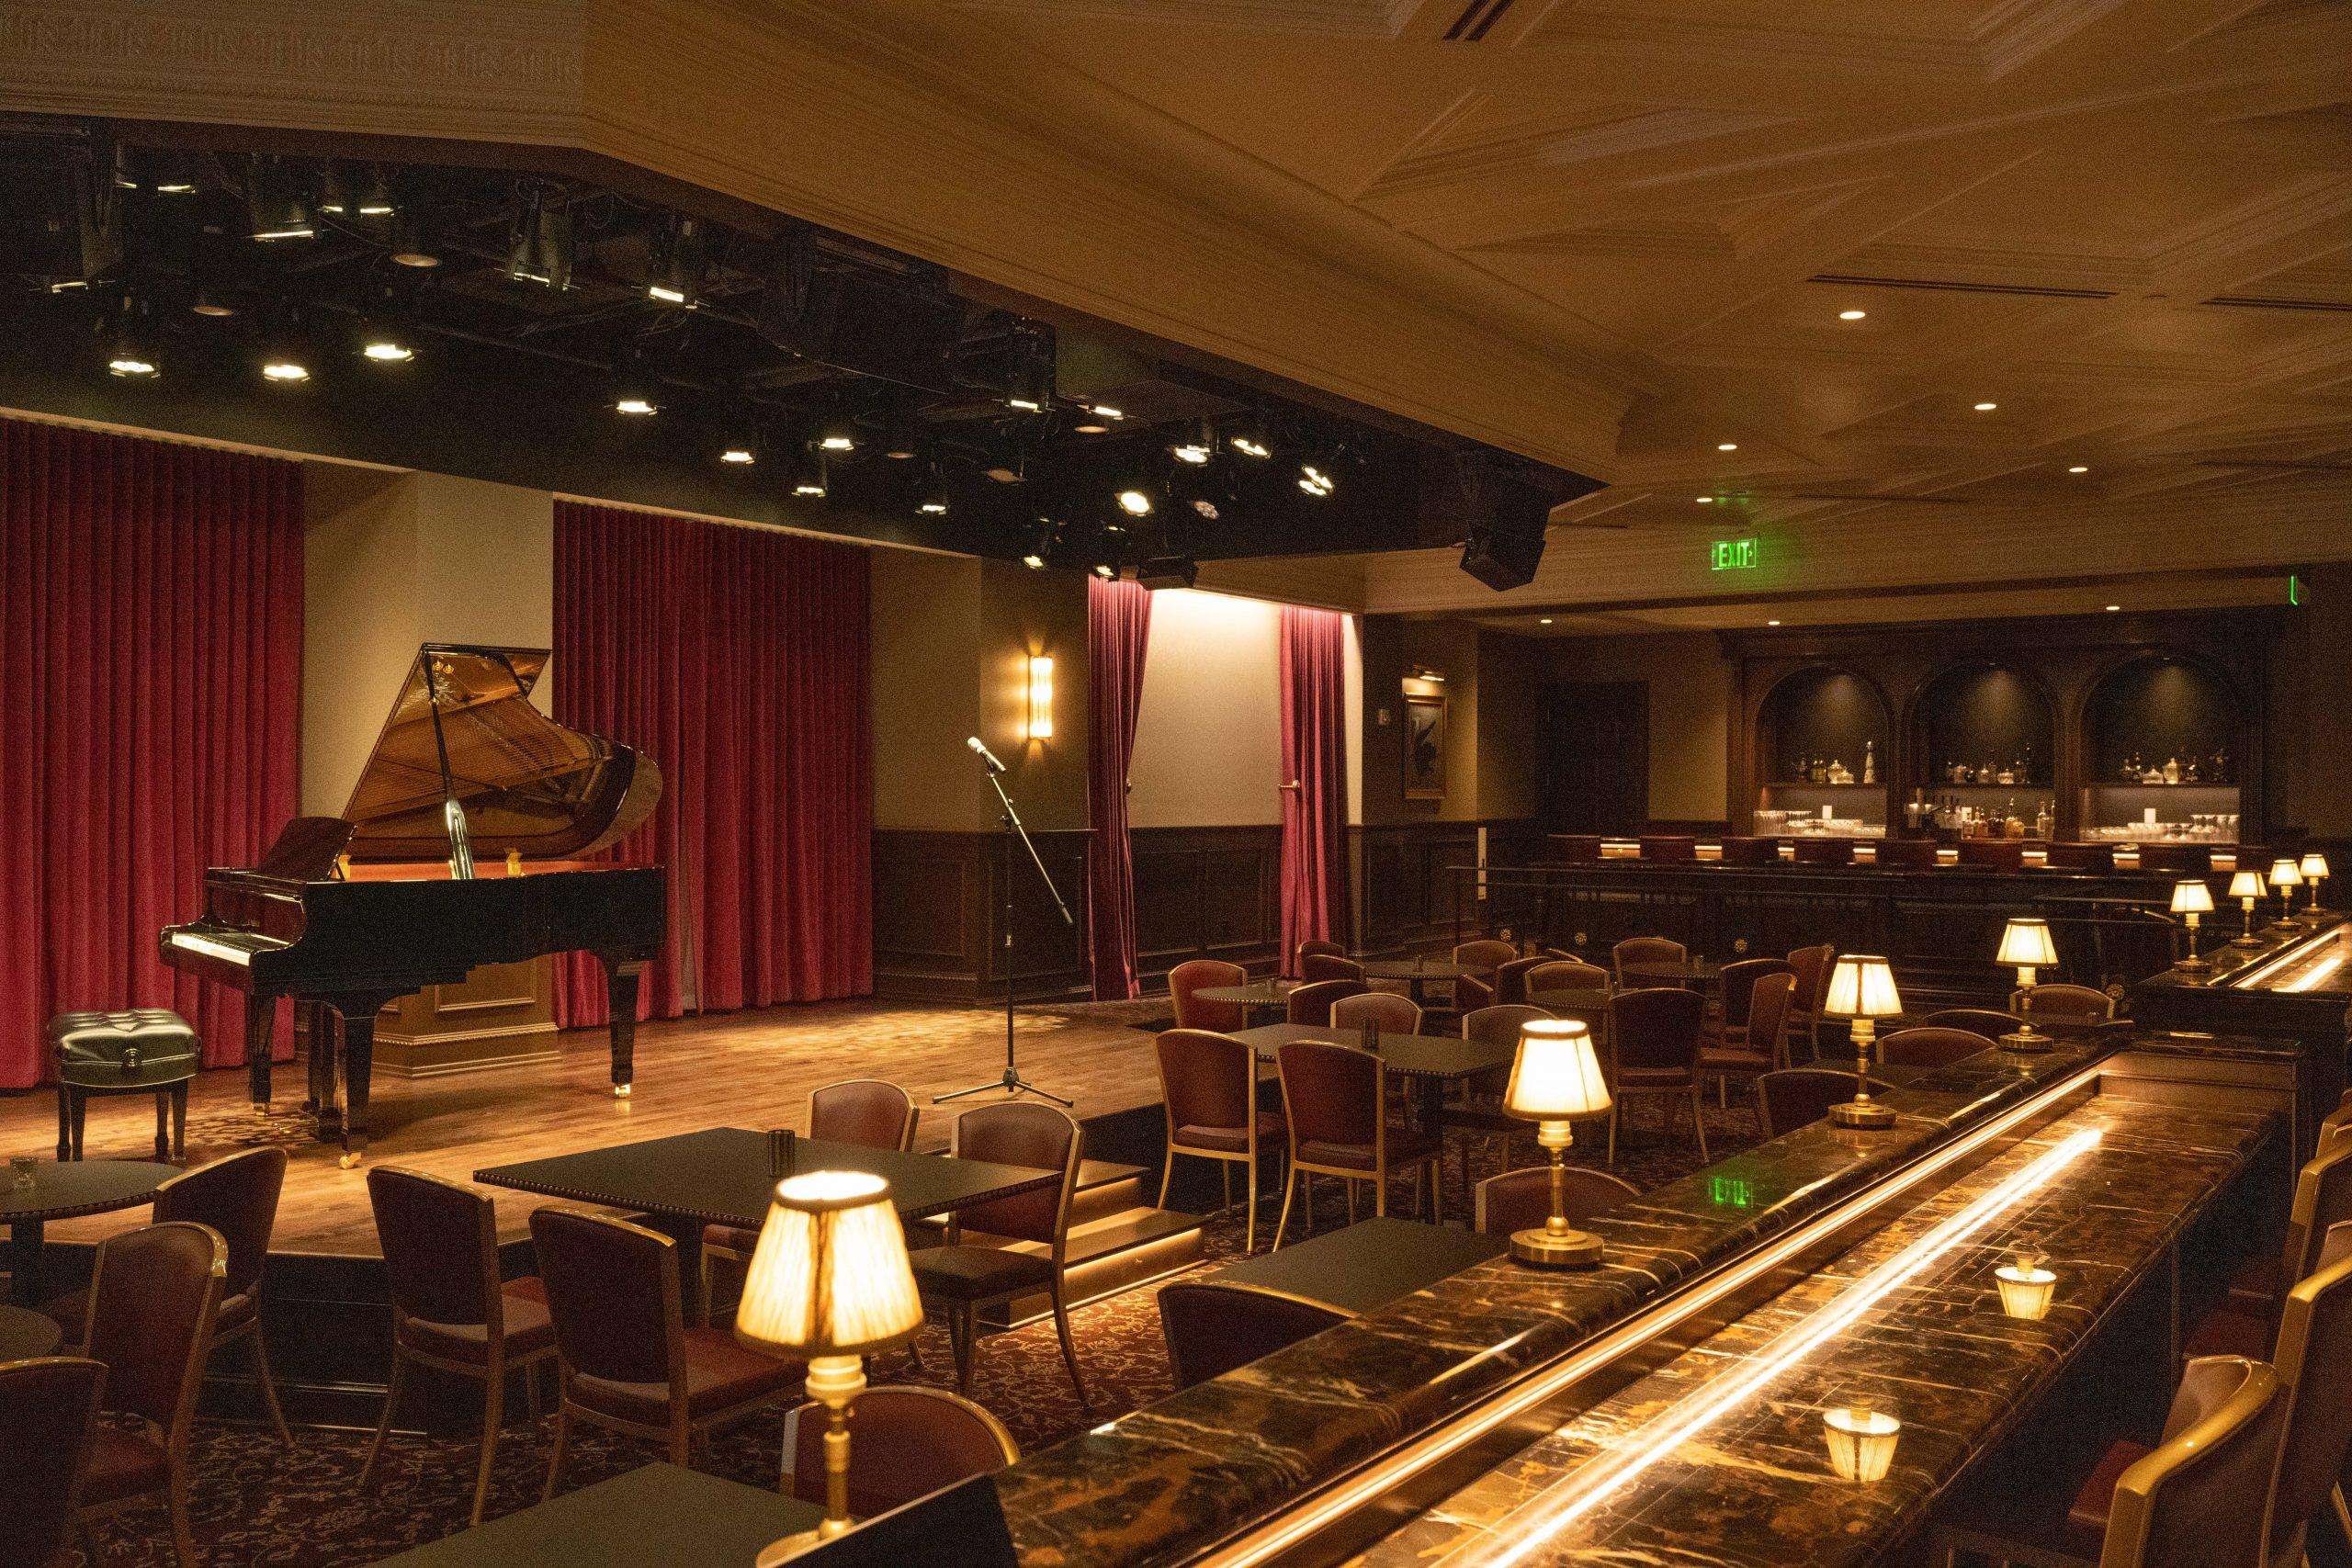 Michael Feinstein:Introducing Feinstein's at Hotel Carmichael